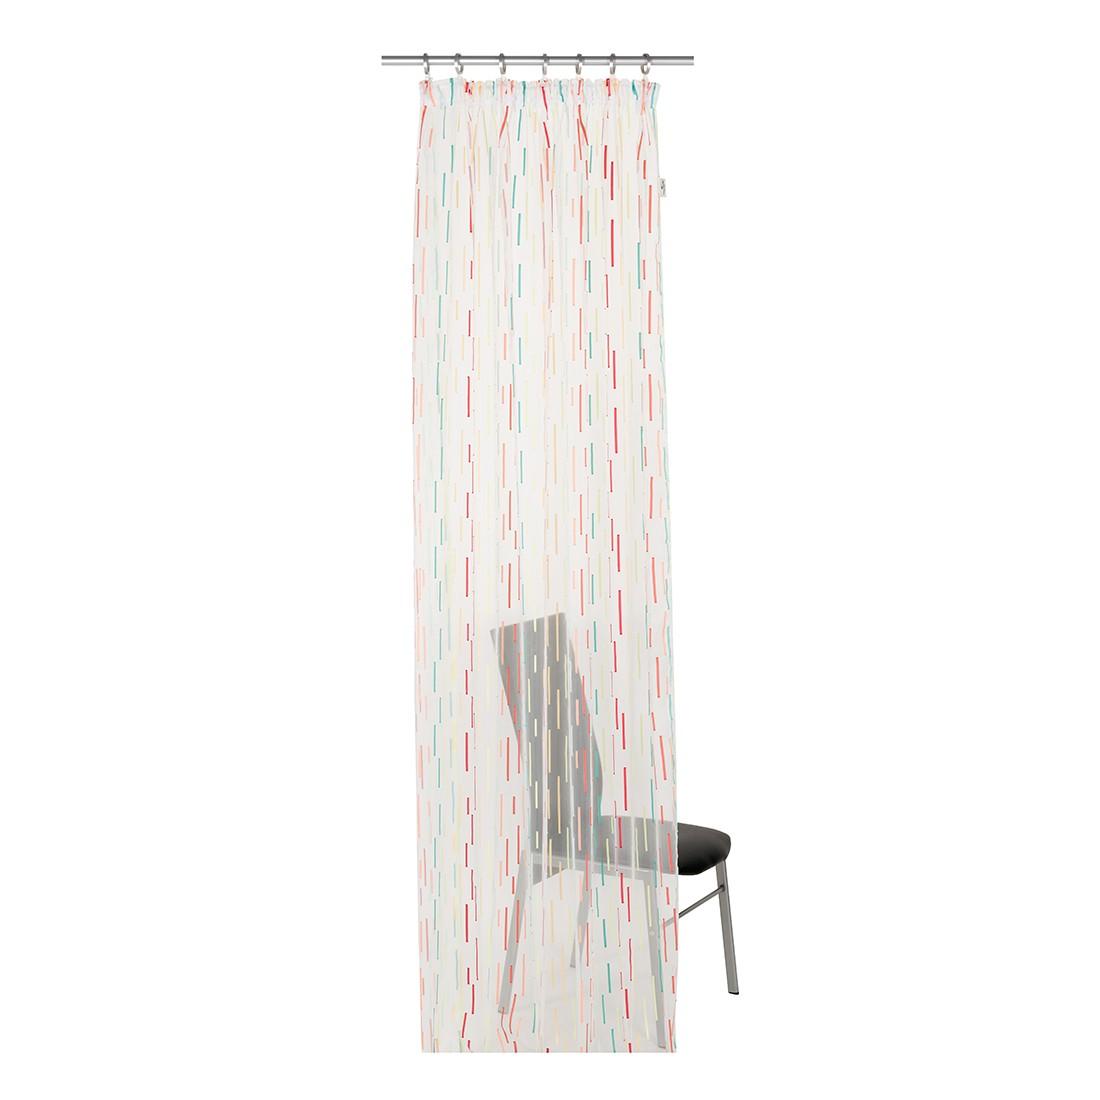 Gardinenschal T-Streak – Multicolor – Maße: 140 x 245 cm, Tom Tailor jetzt kaufen